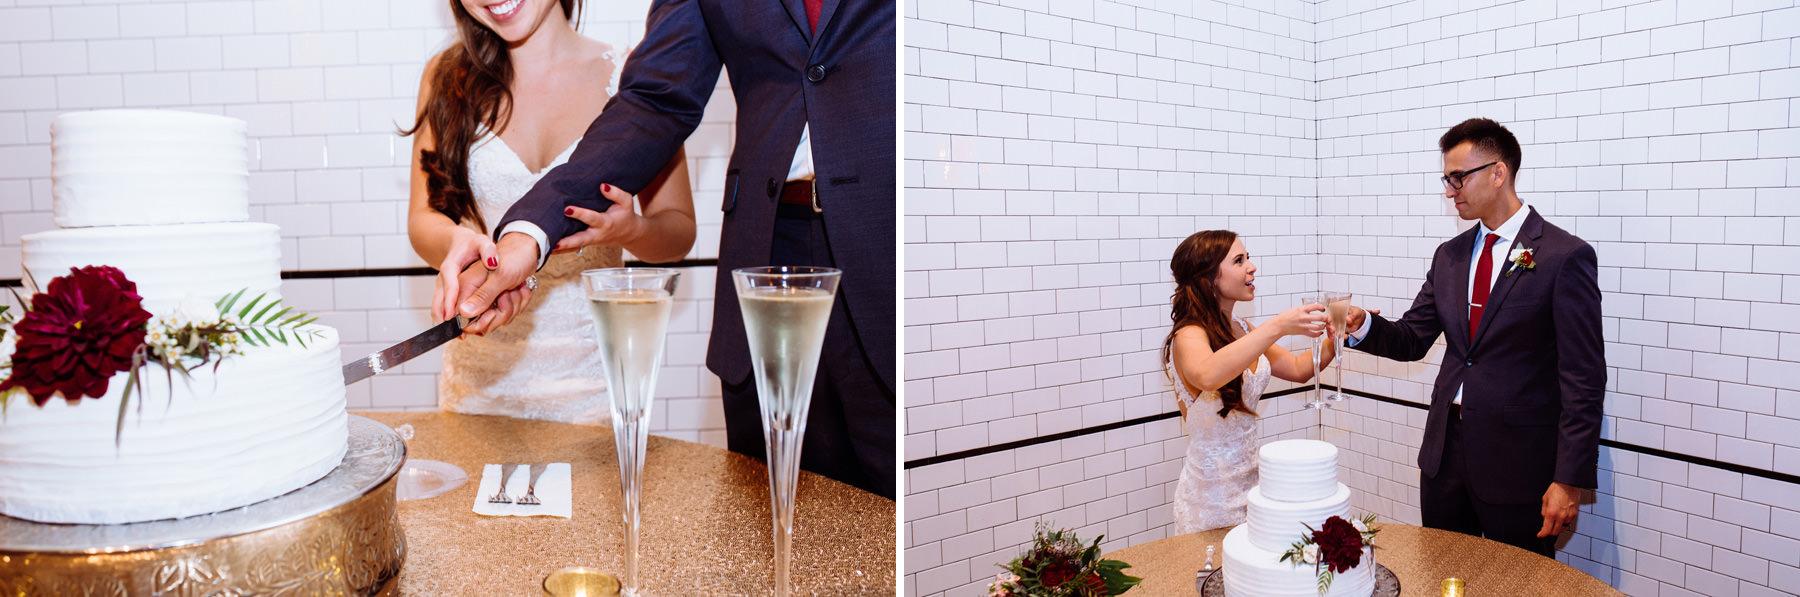 Kansas City Summer Wedding at the Guild_Kindling Wedding Photography Blog71.JPG